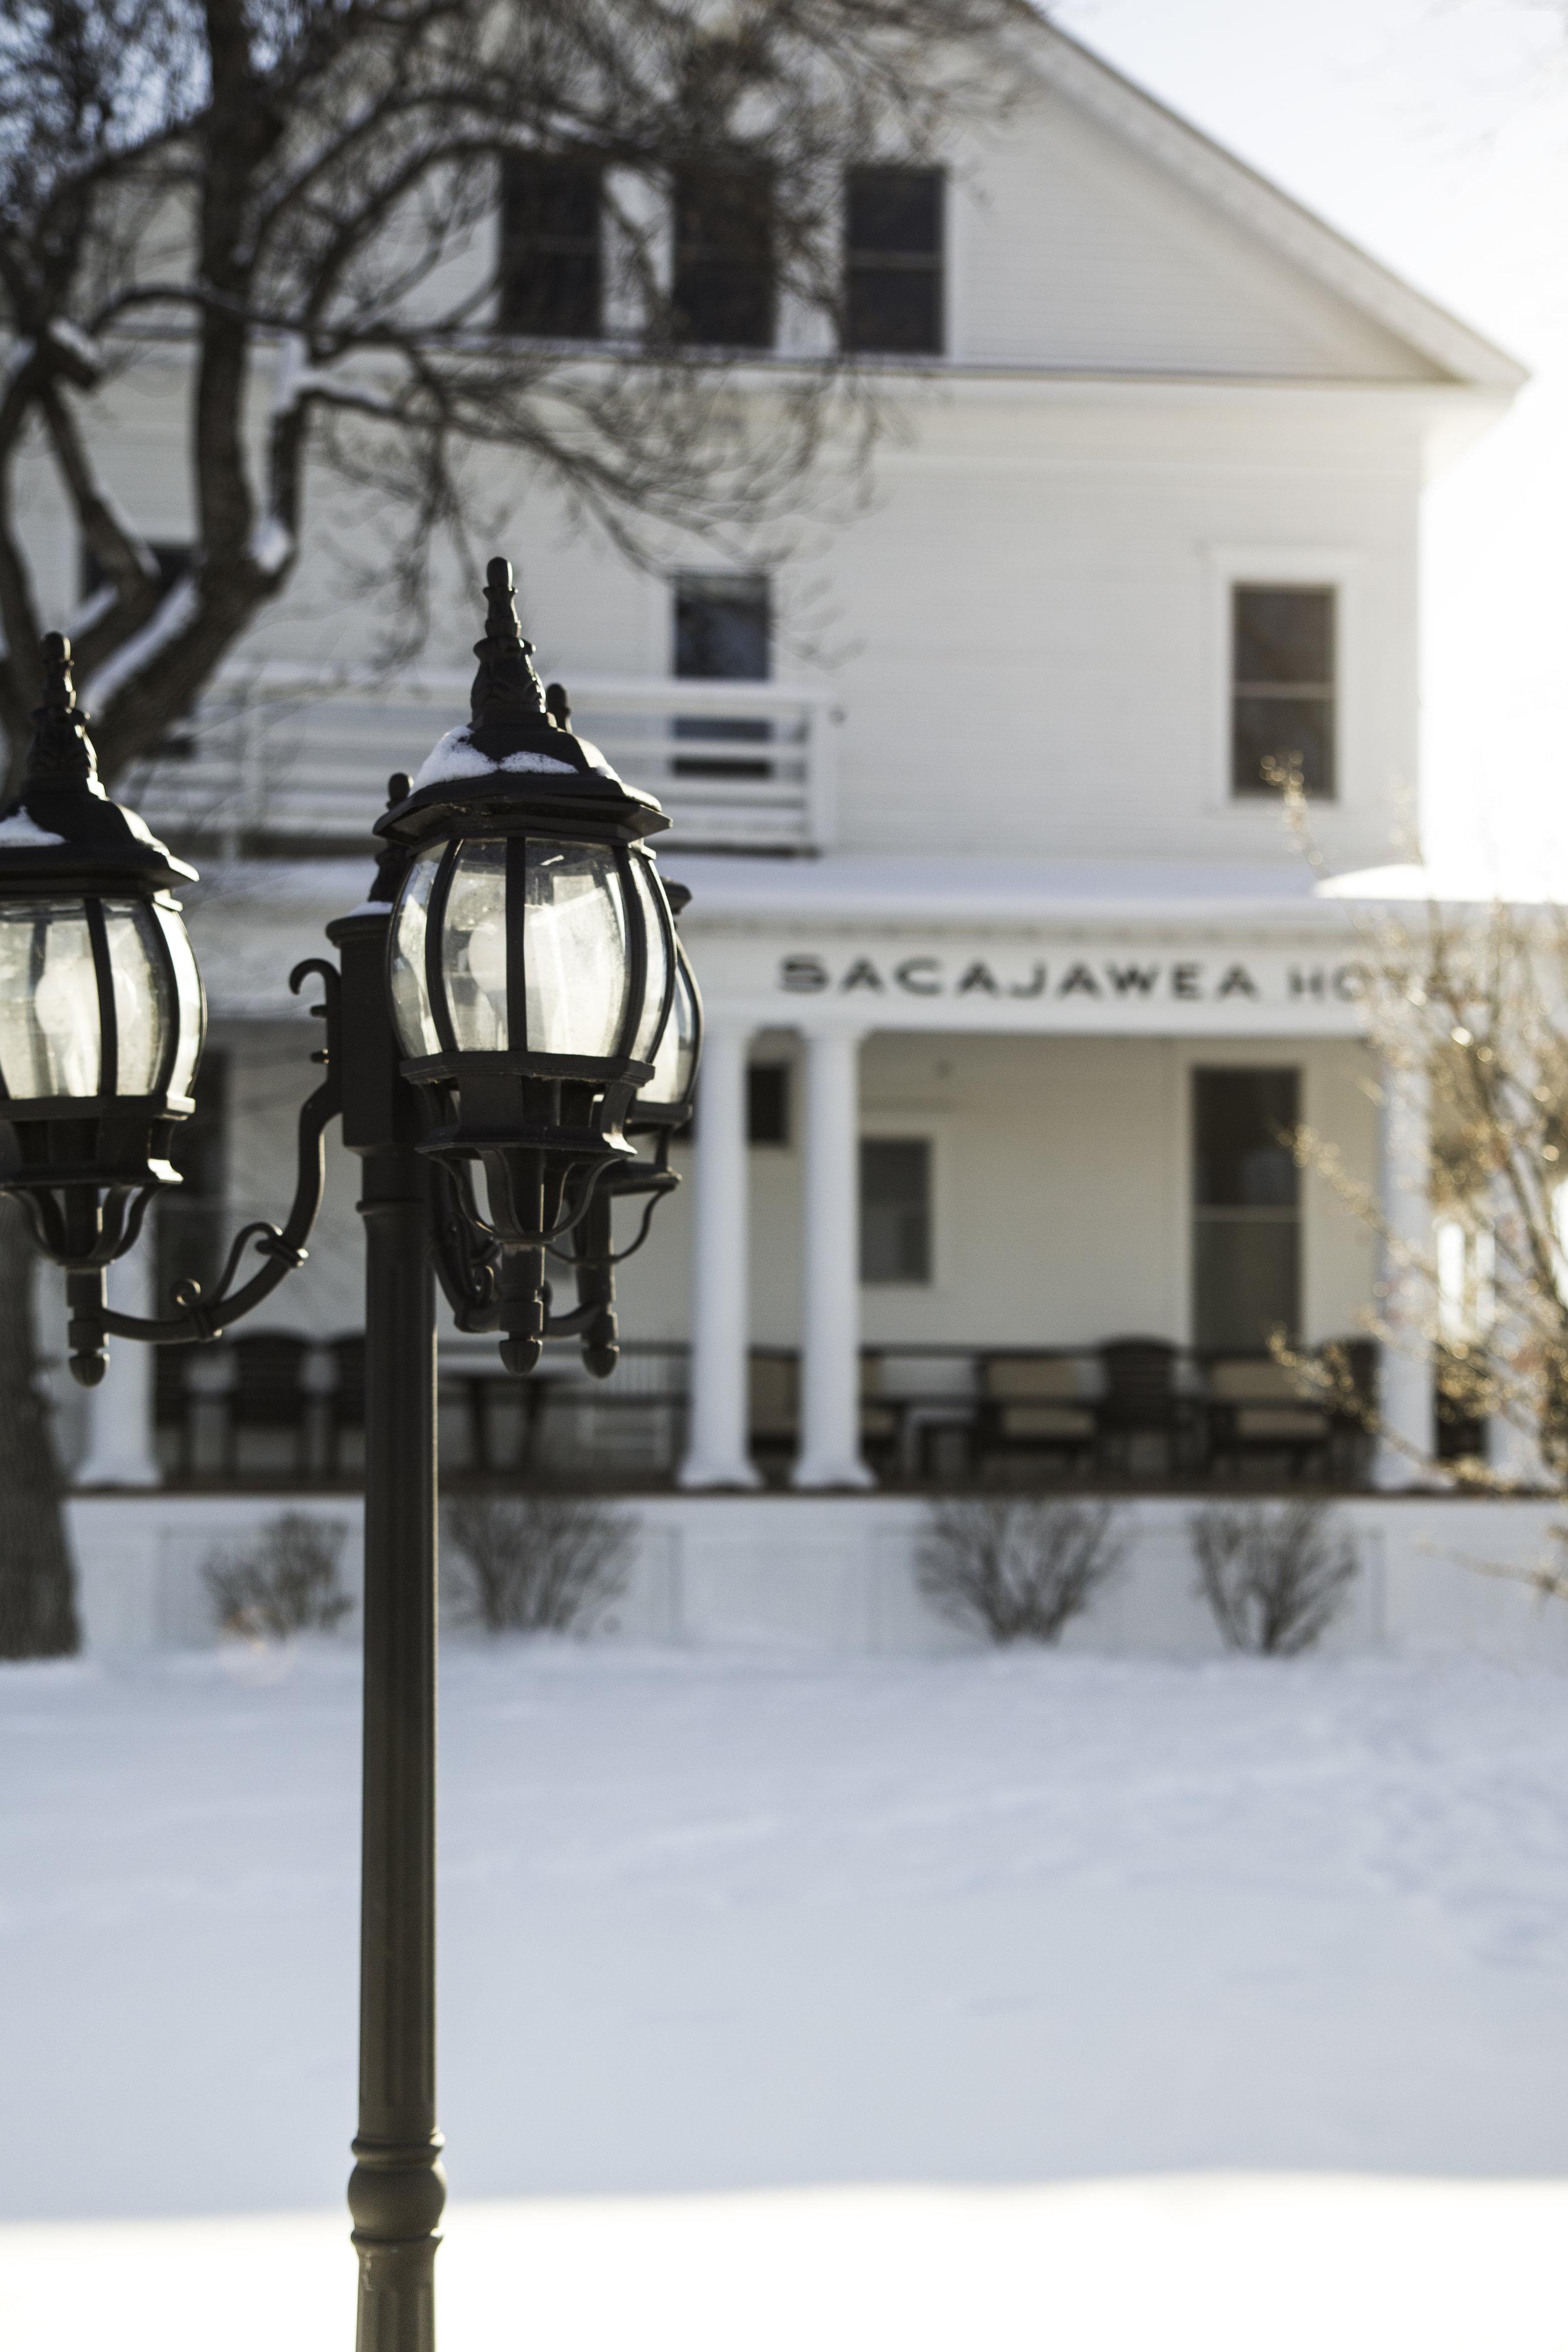 Sacajawea Hotel in Three Forks, Montana